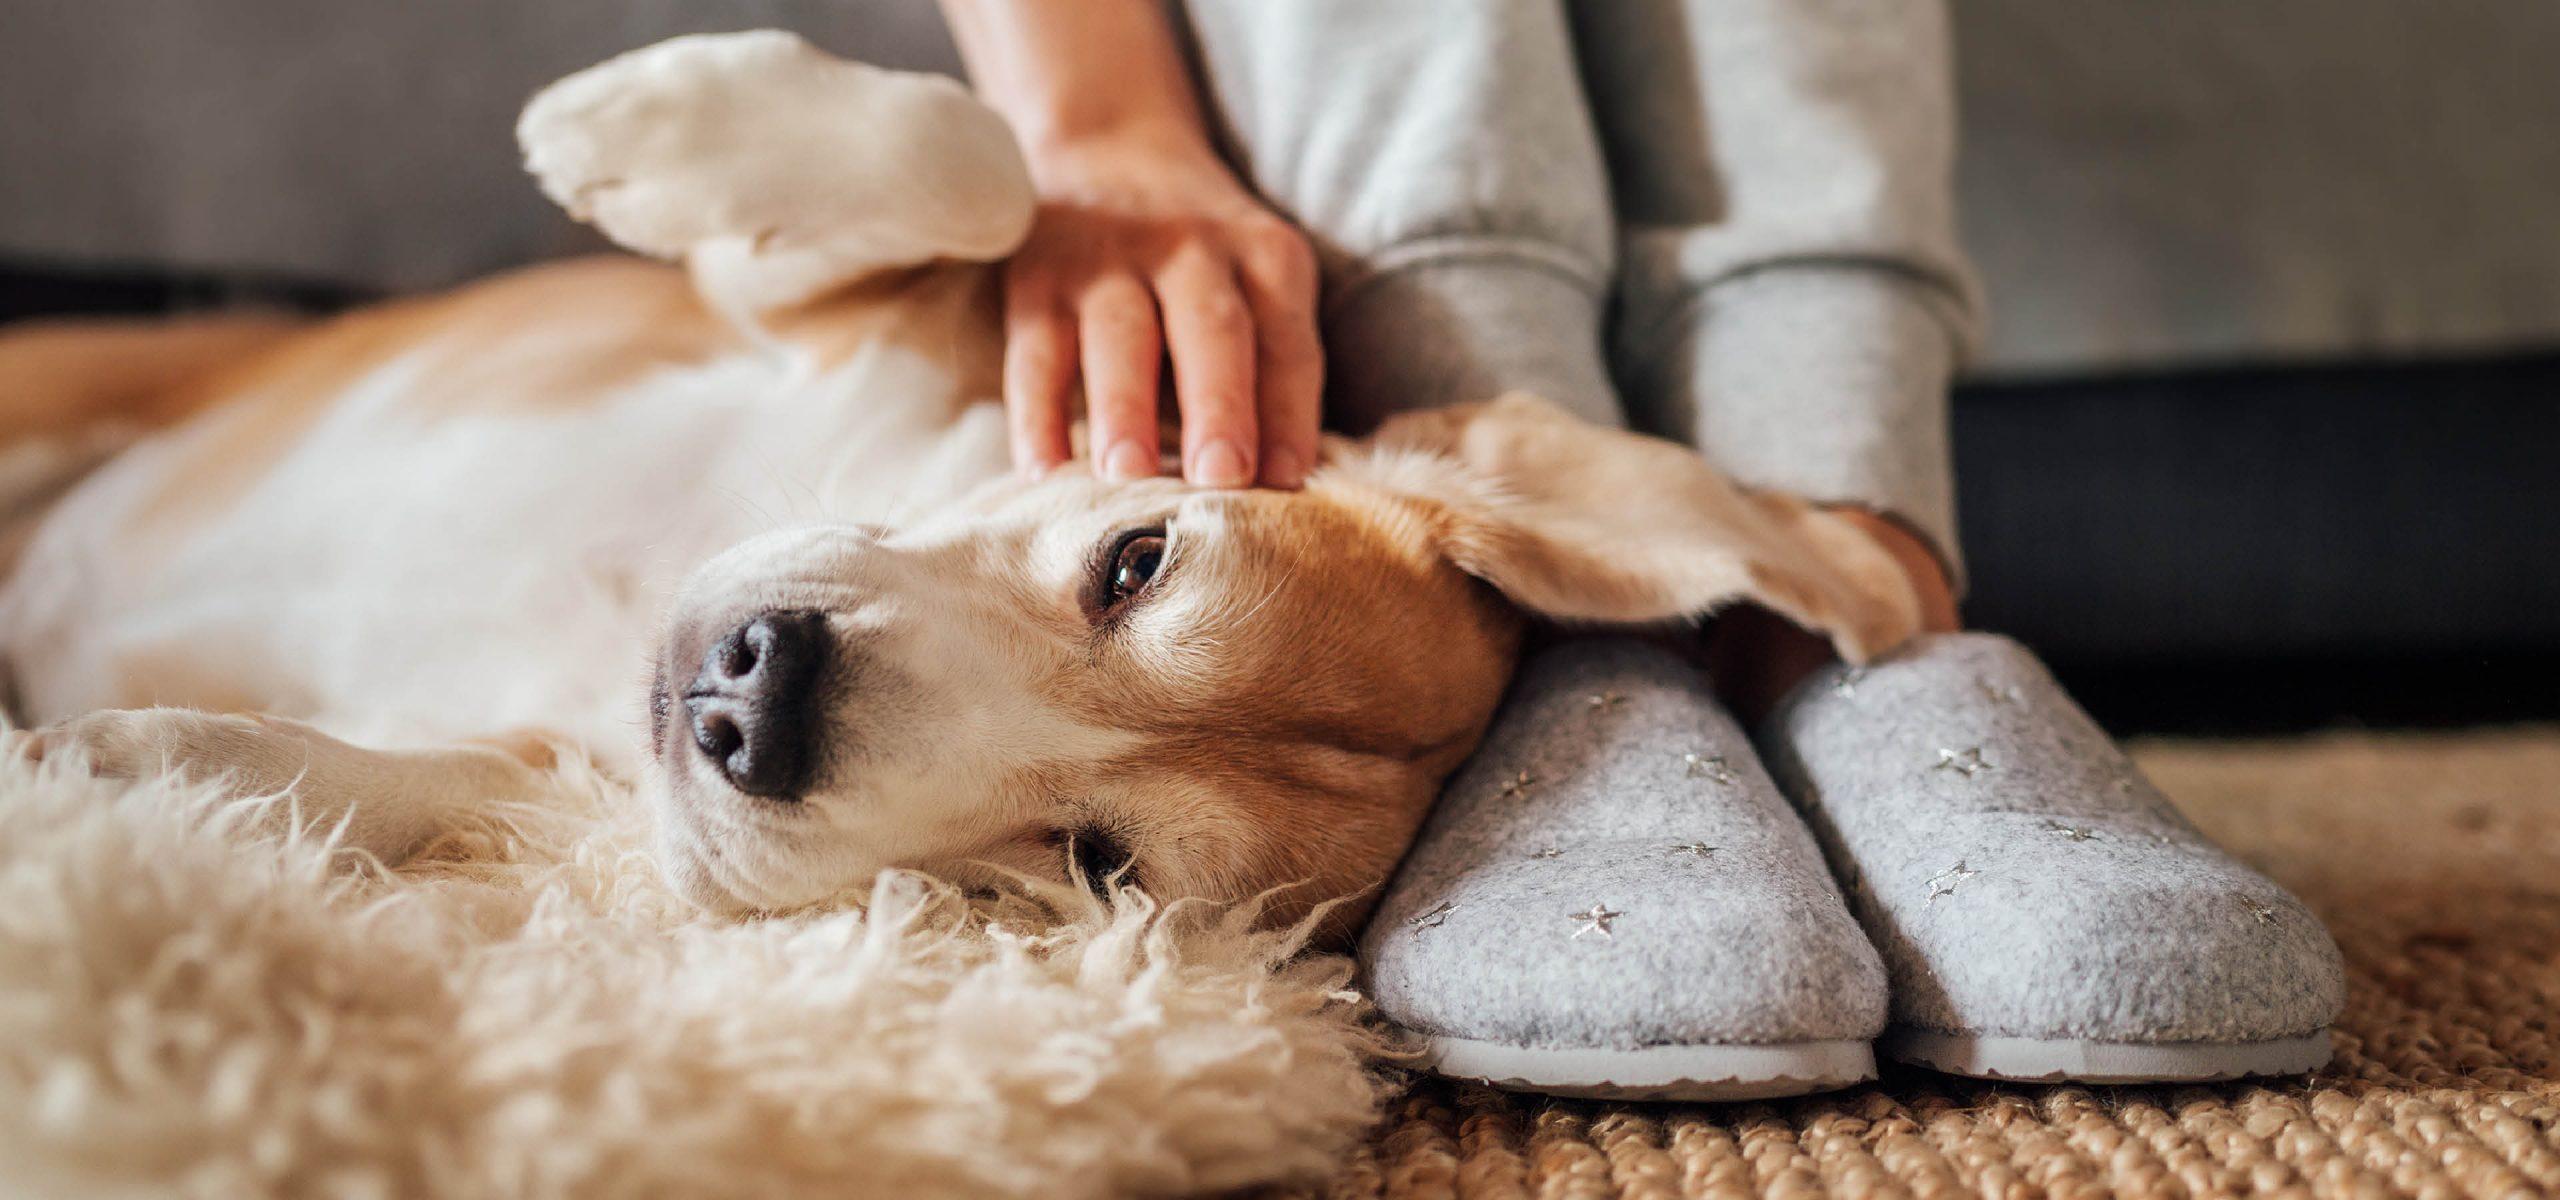 Golden Retriever, kuscheln, streicheln, Hunde